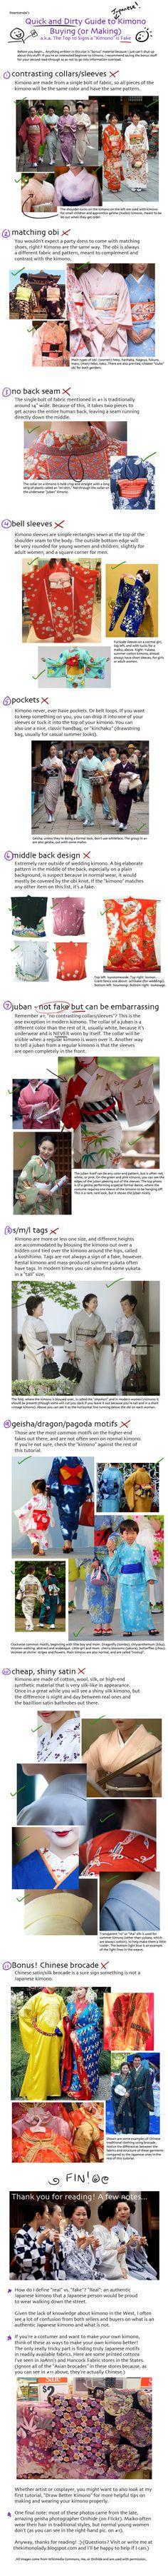 Tutorial: Real or Fake Kimono? by *iheartsendai on deviantART